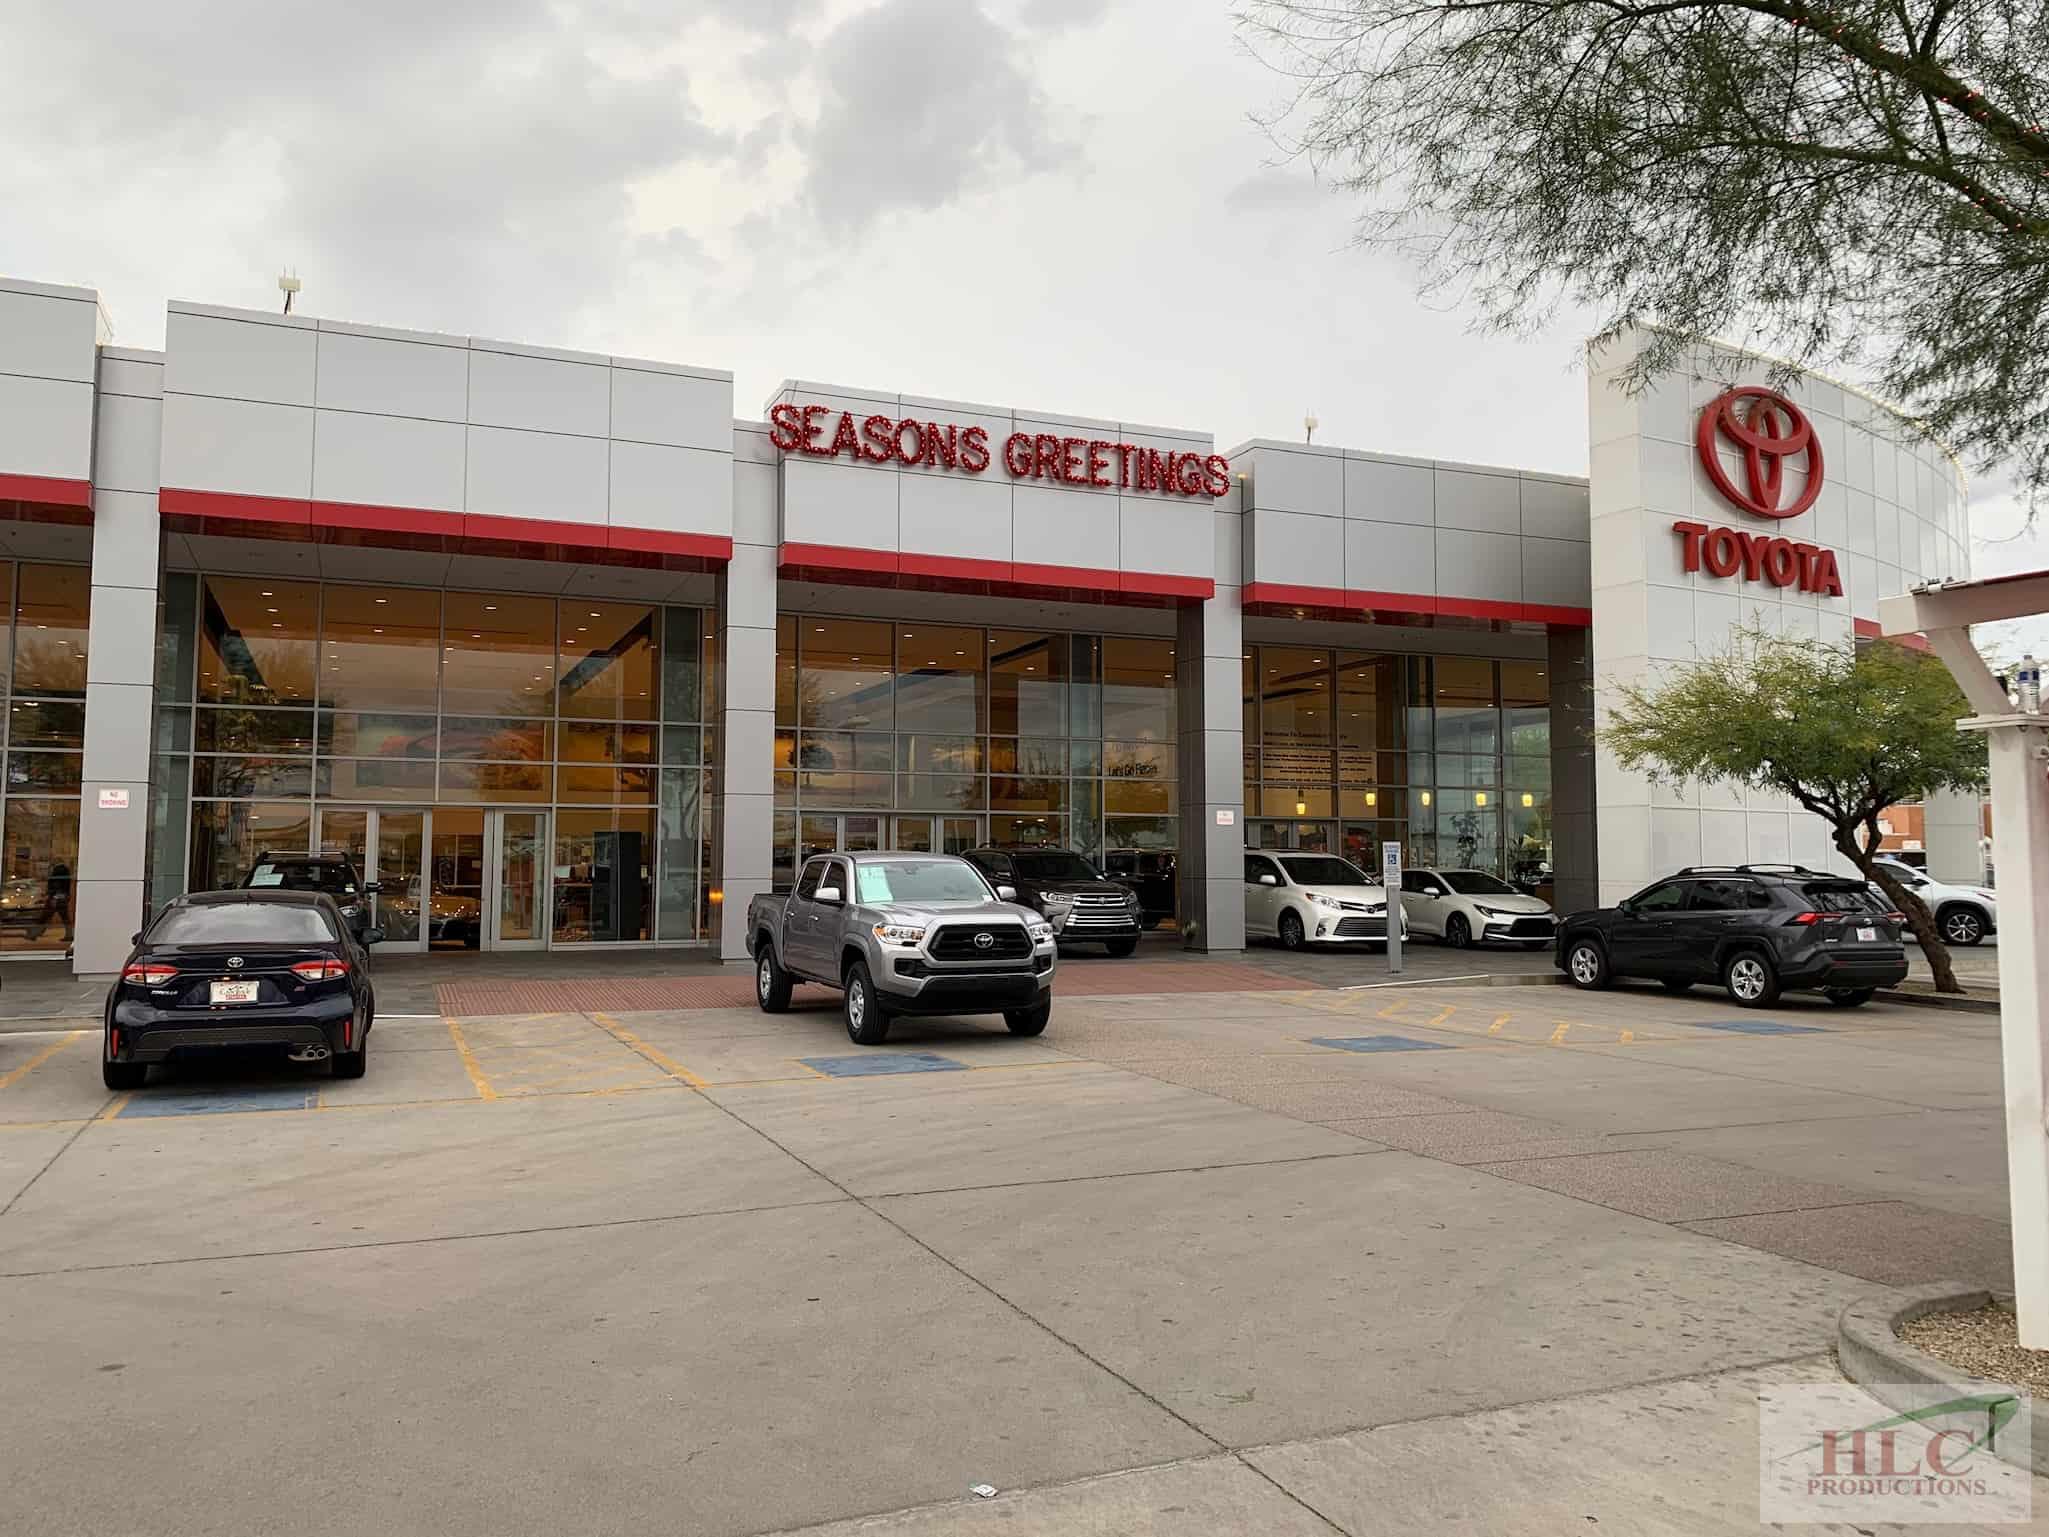 Toyota Dealership - Sign-1